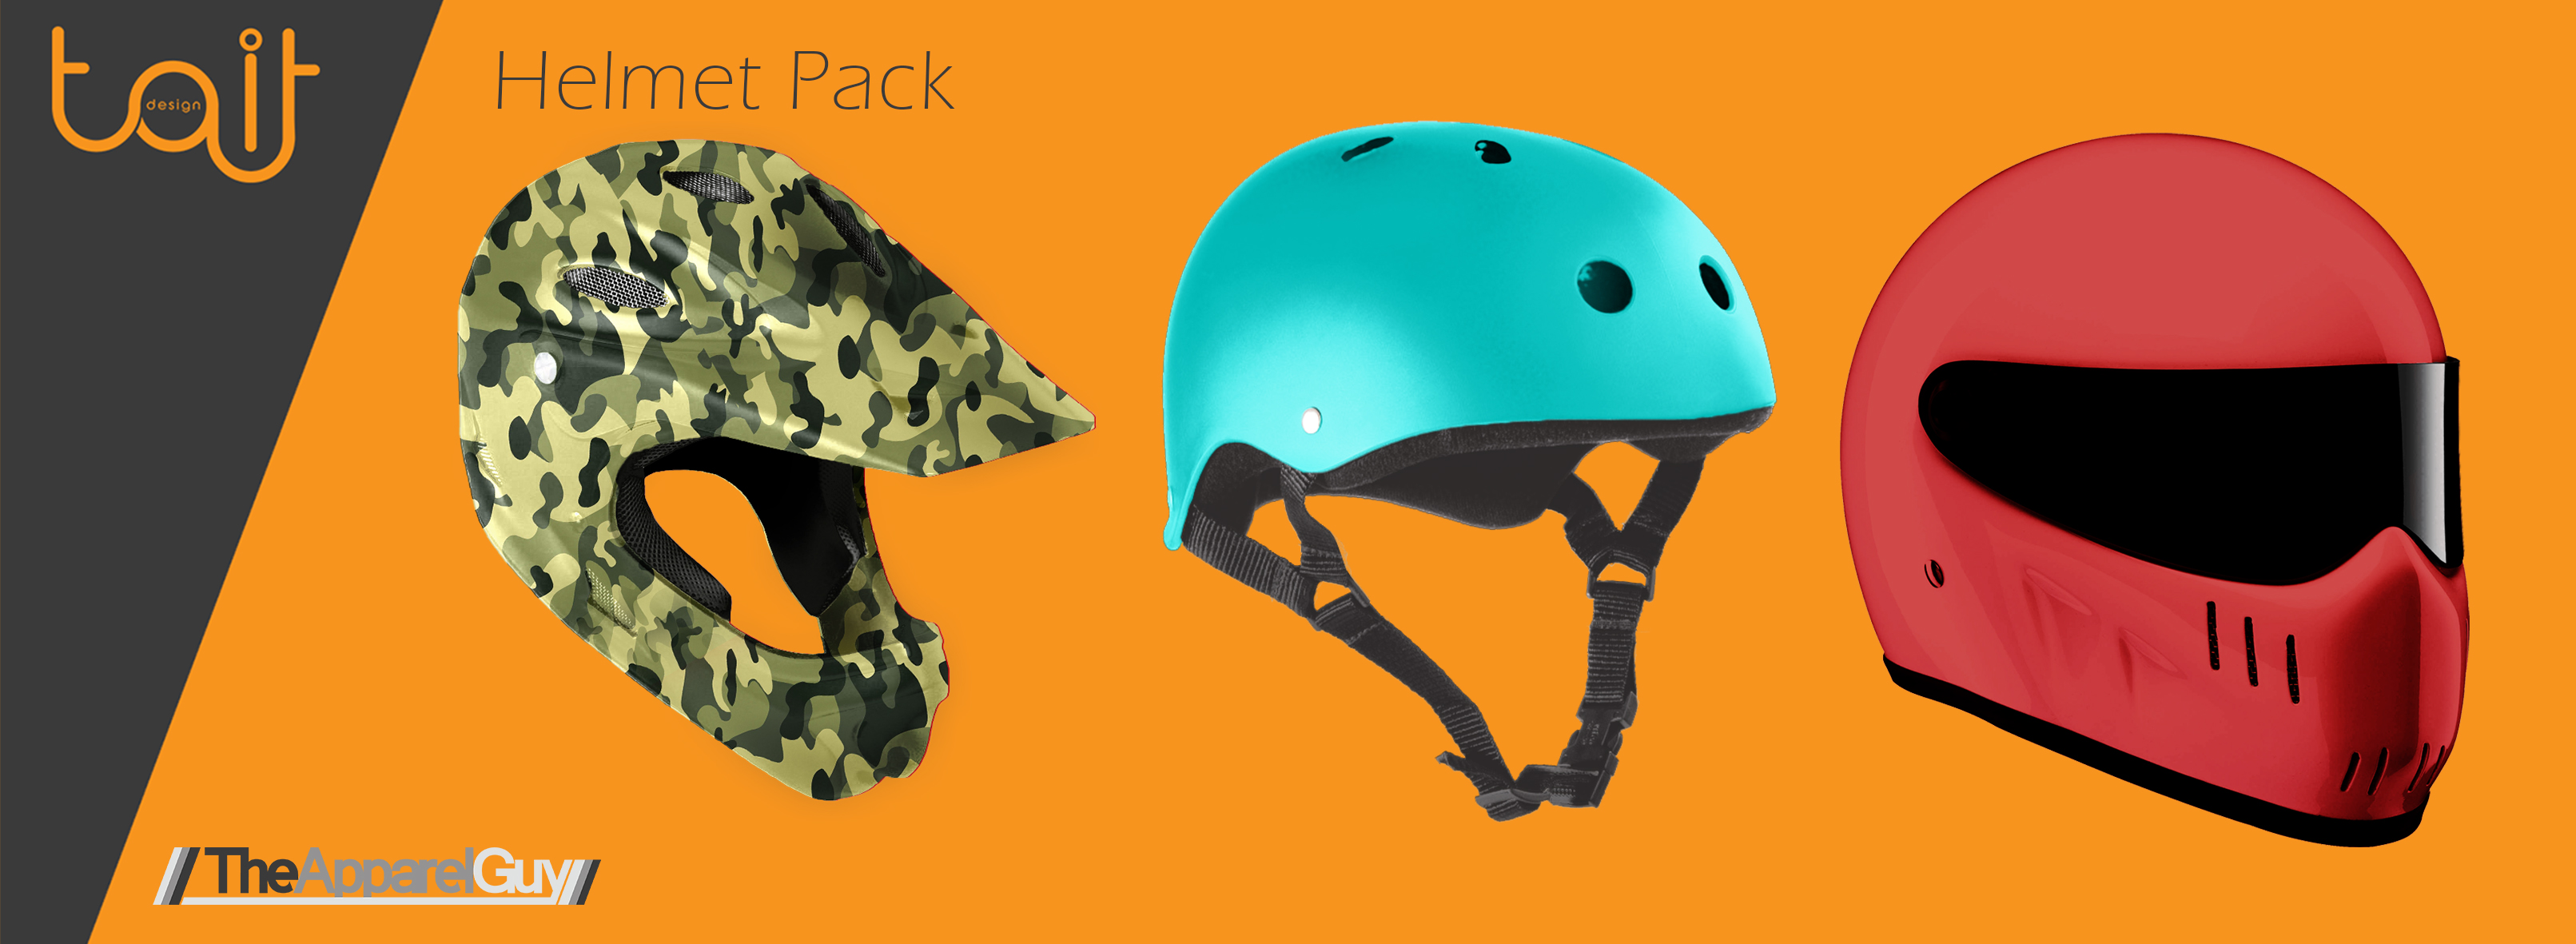 Helmet Pack by TheApparelGuy